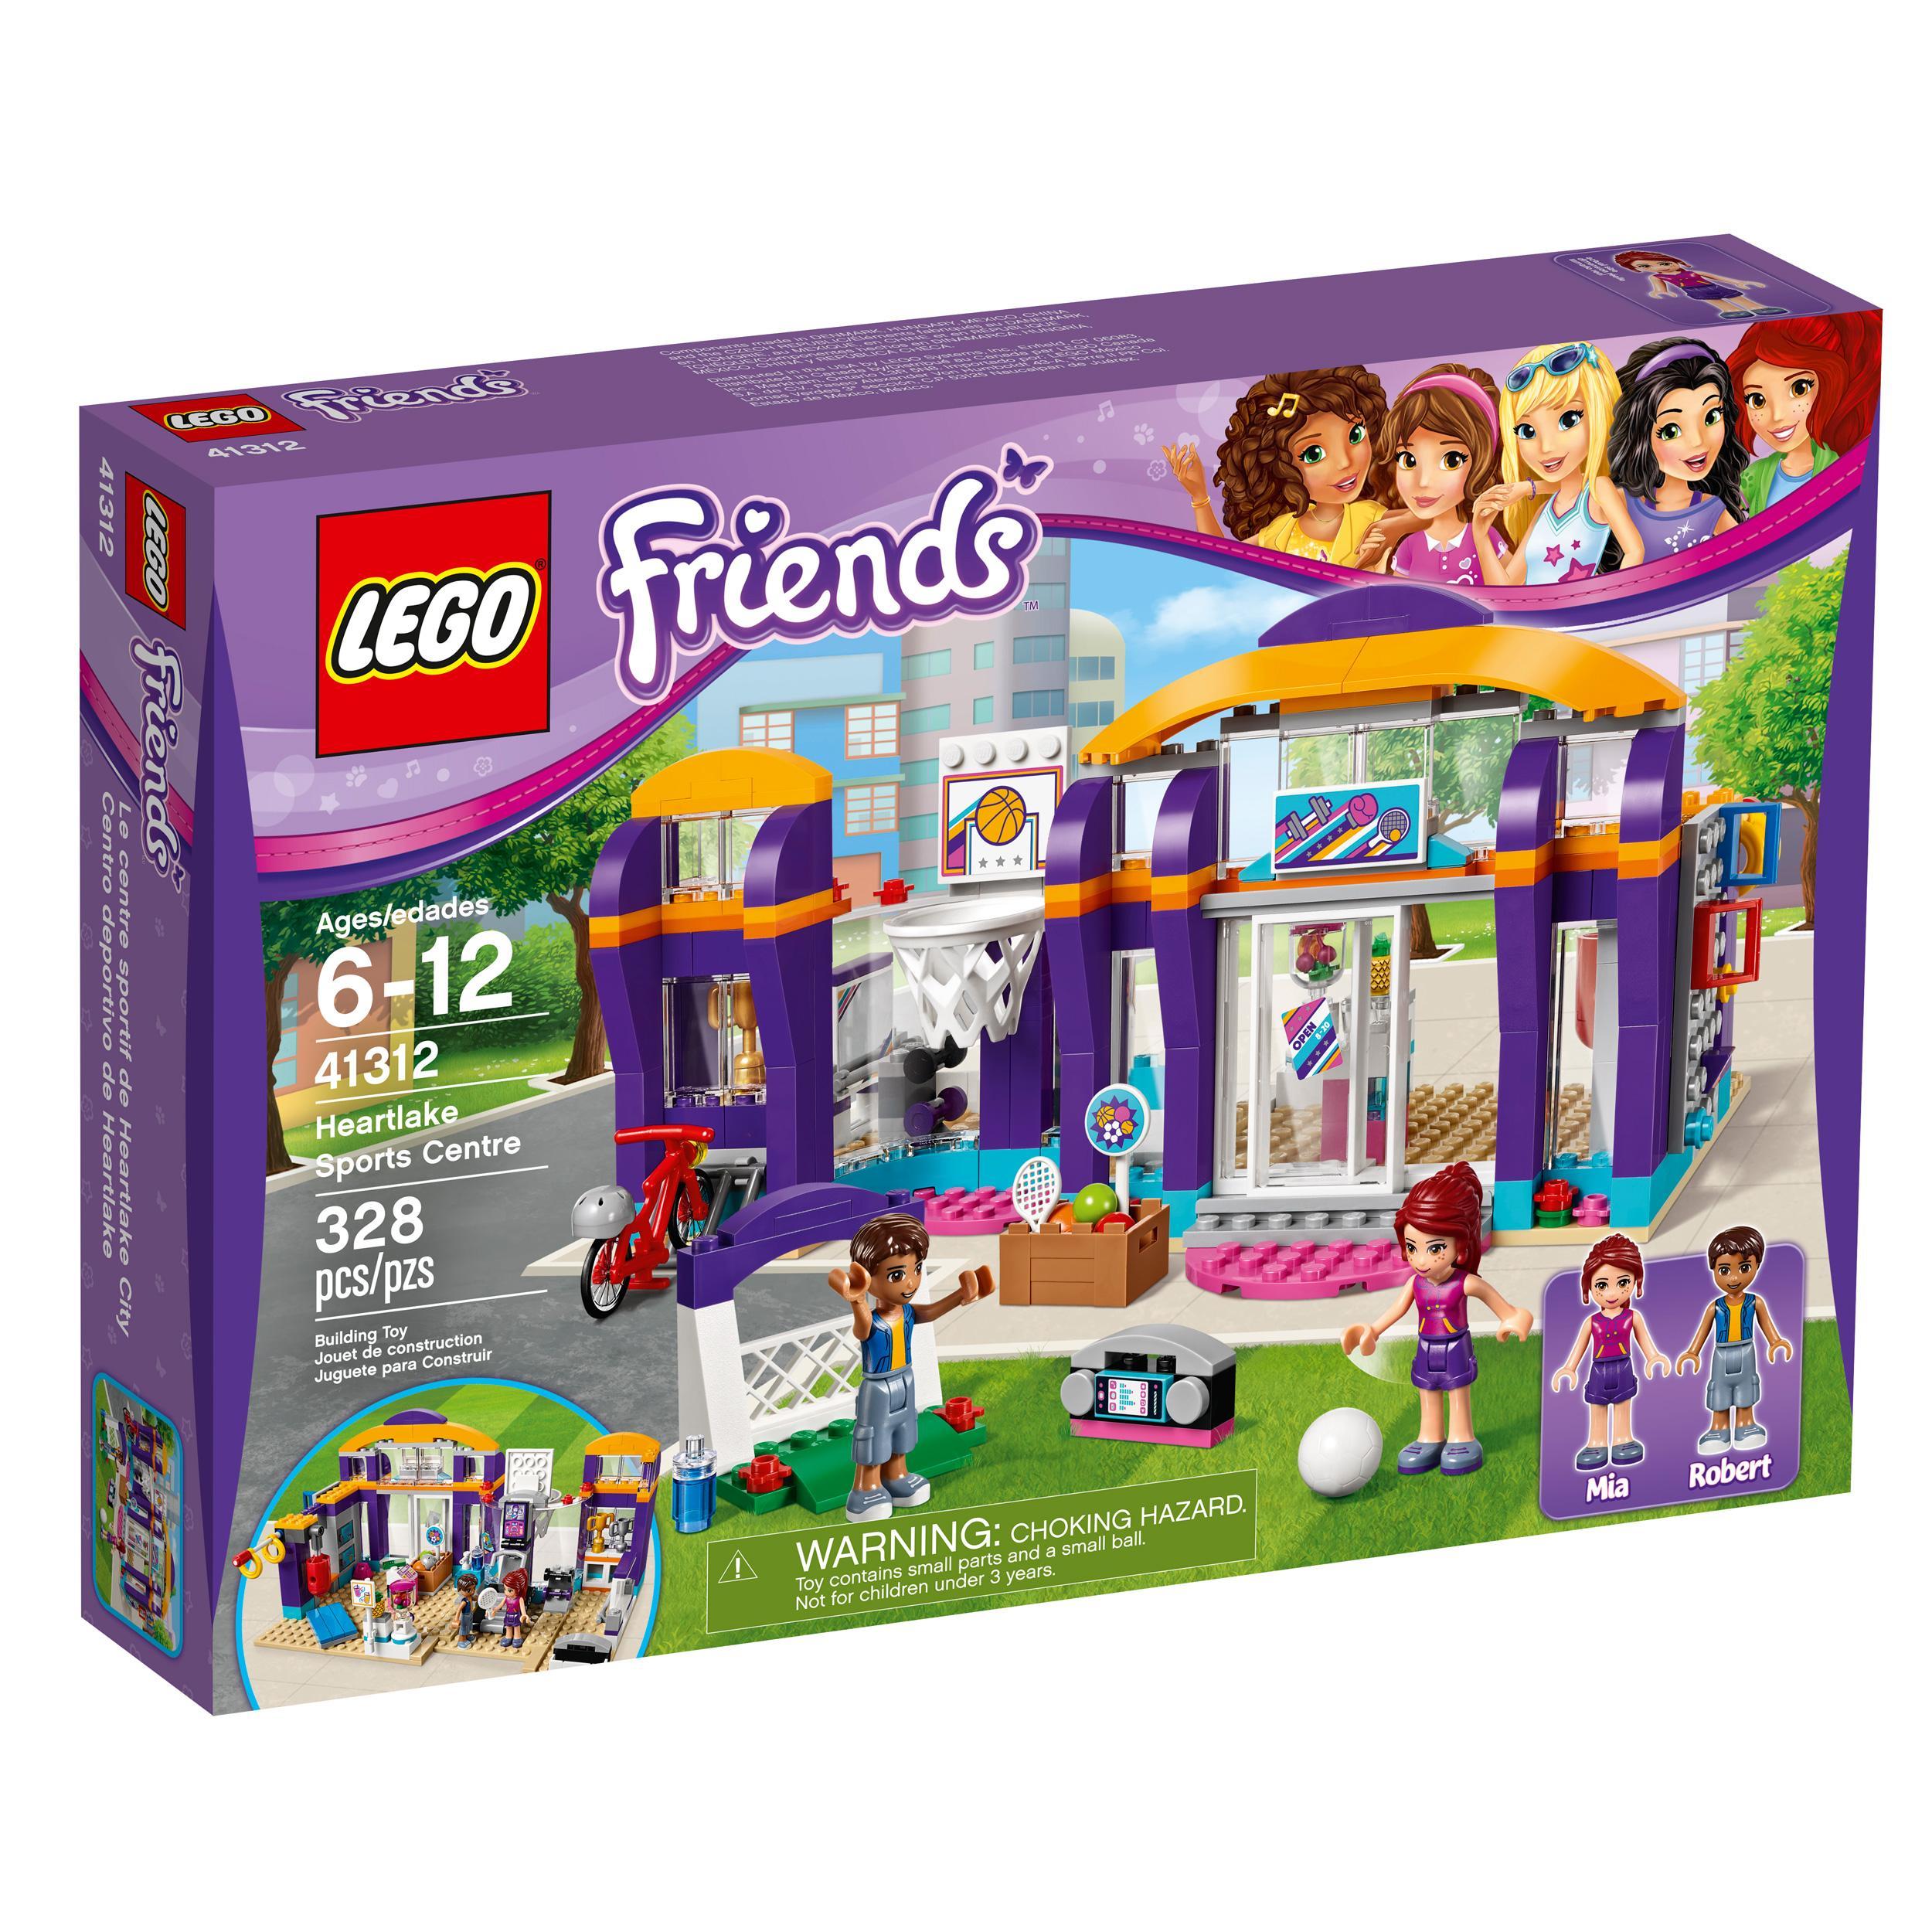 Toys For Legos : Amazon lego friends heartlake sports centre